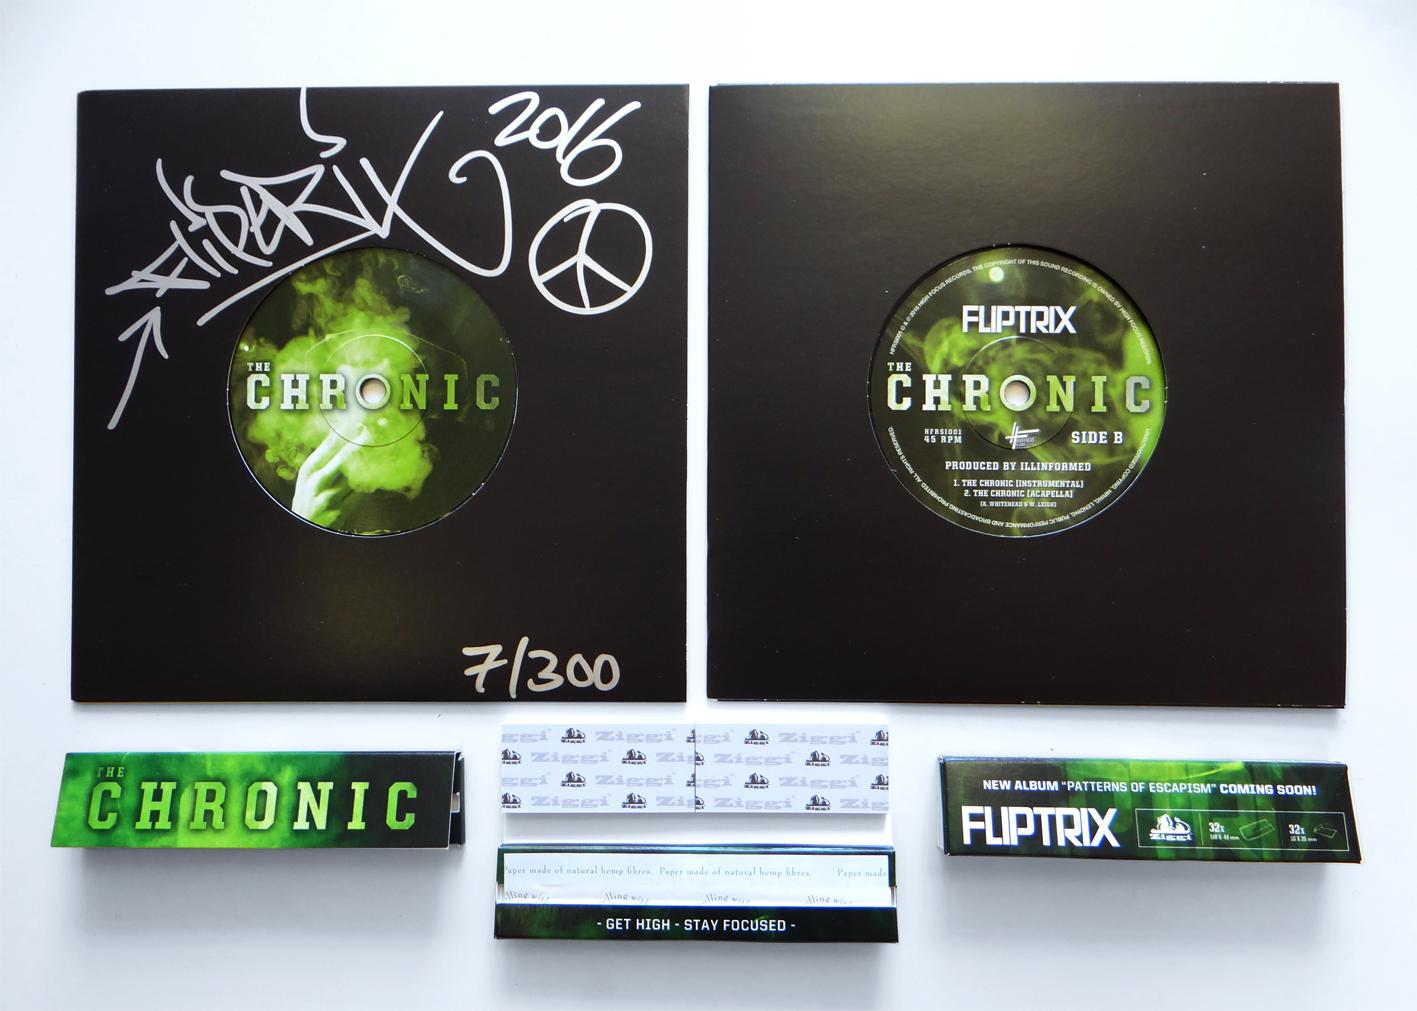 fliptrix_chronic product 7